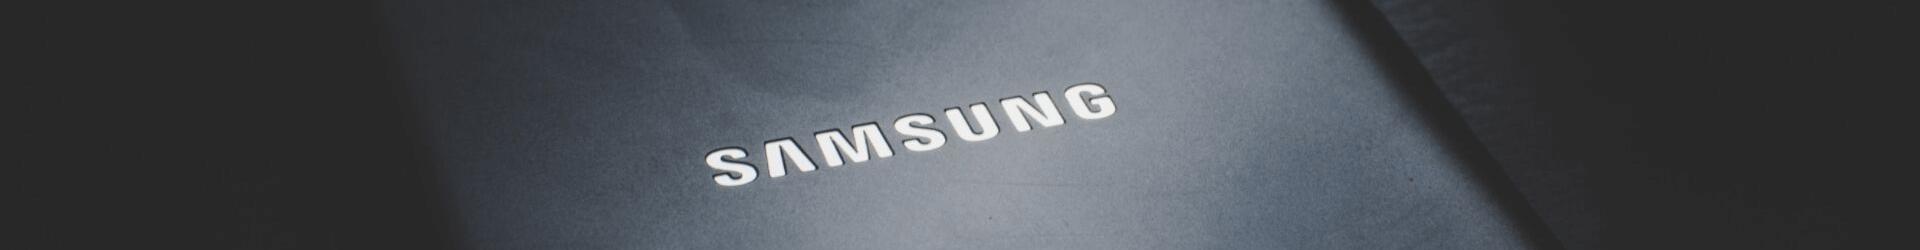 Samsung 三星 s6 電池膨脹 更換電池